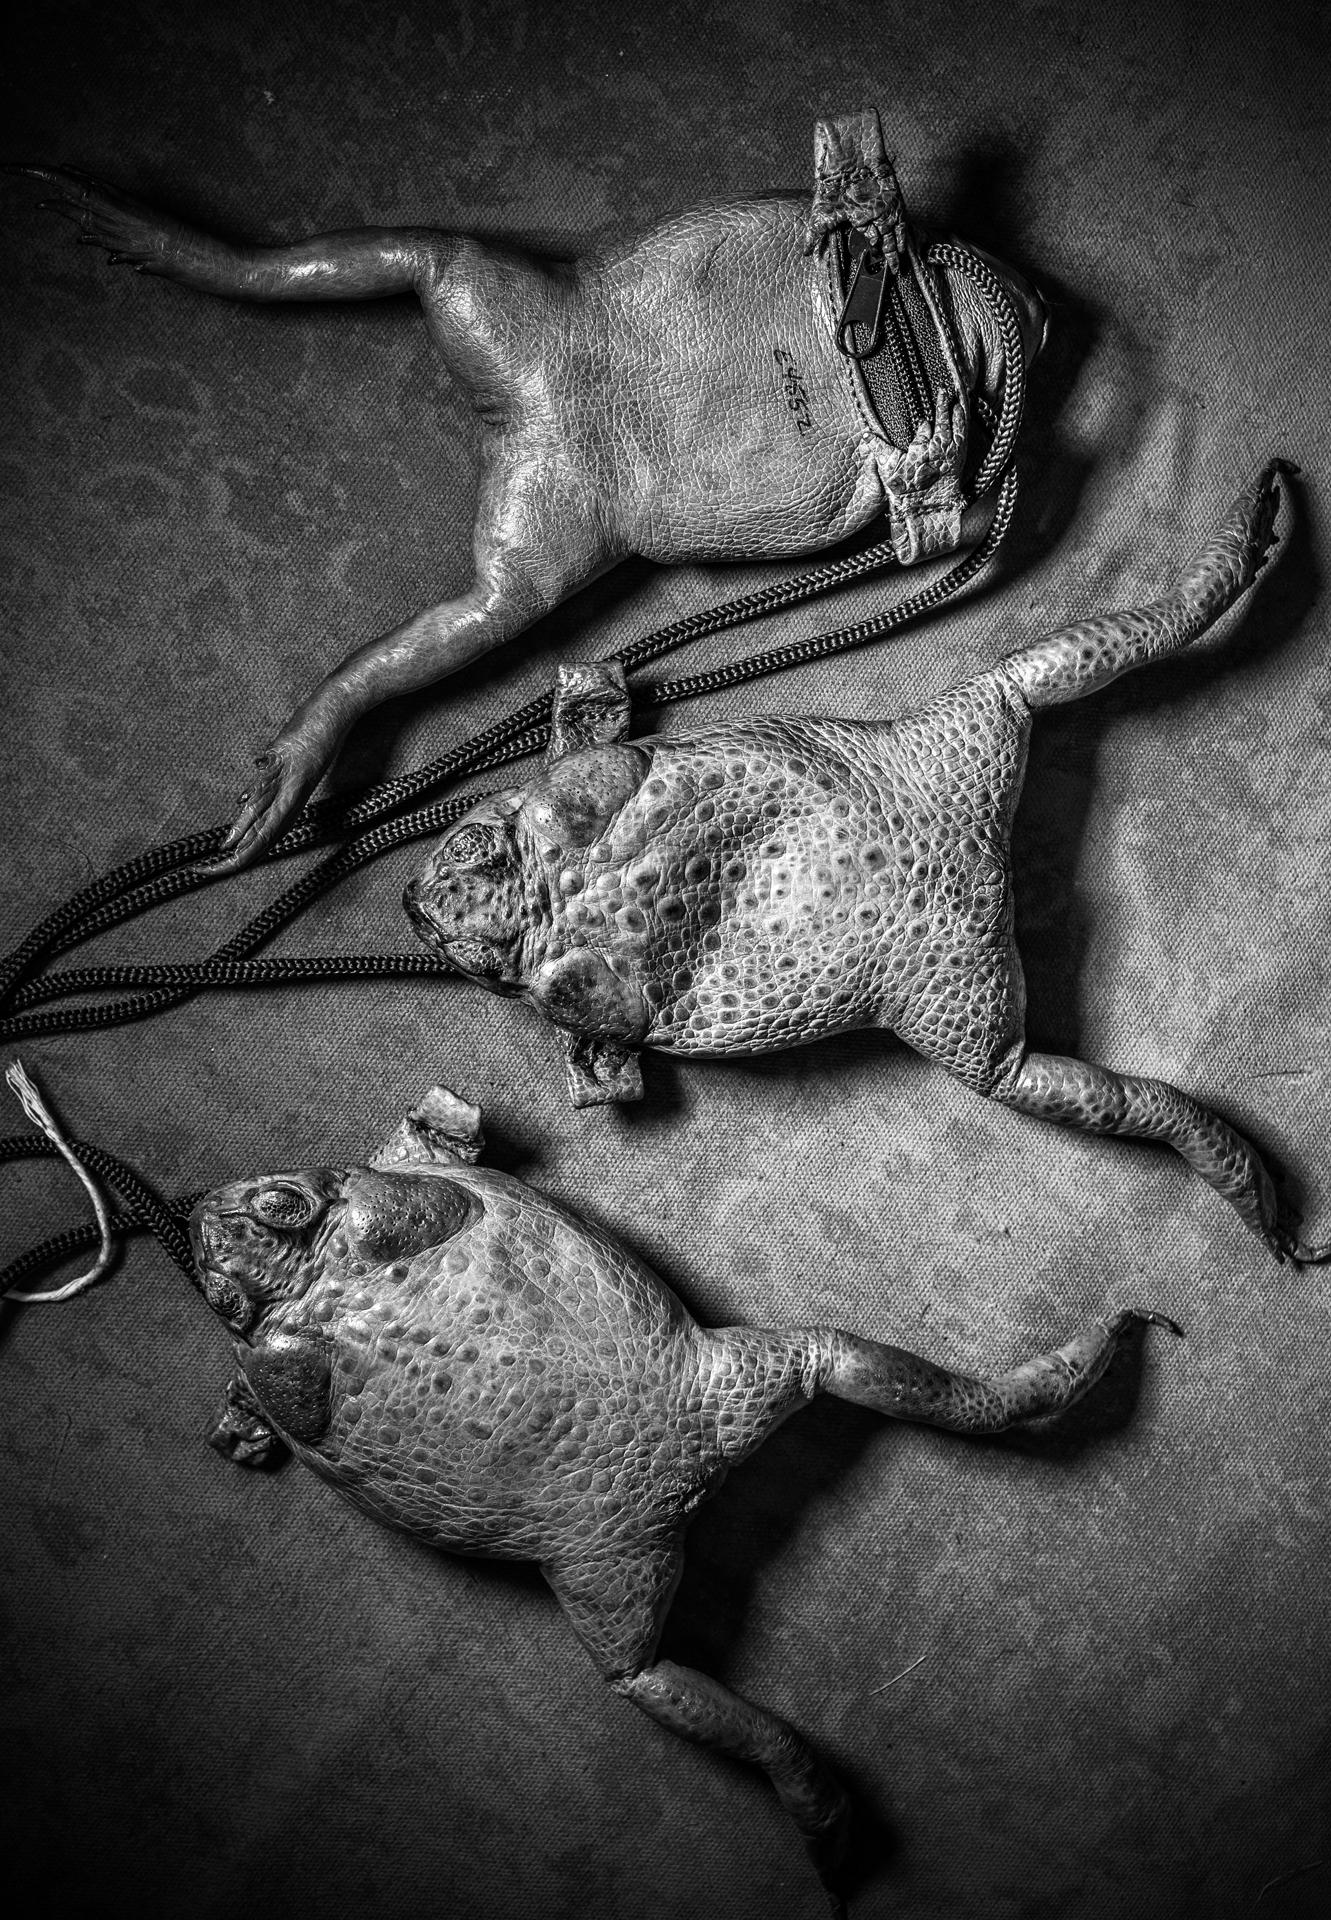 toad purses